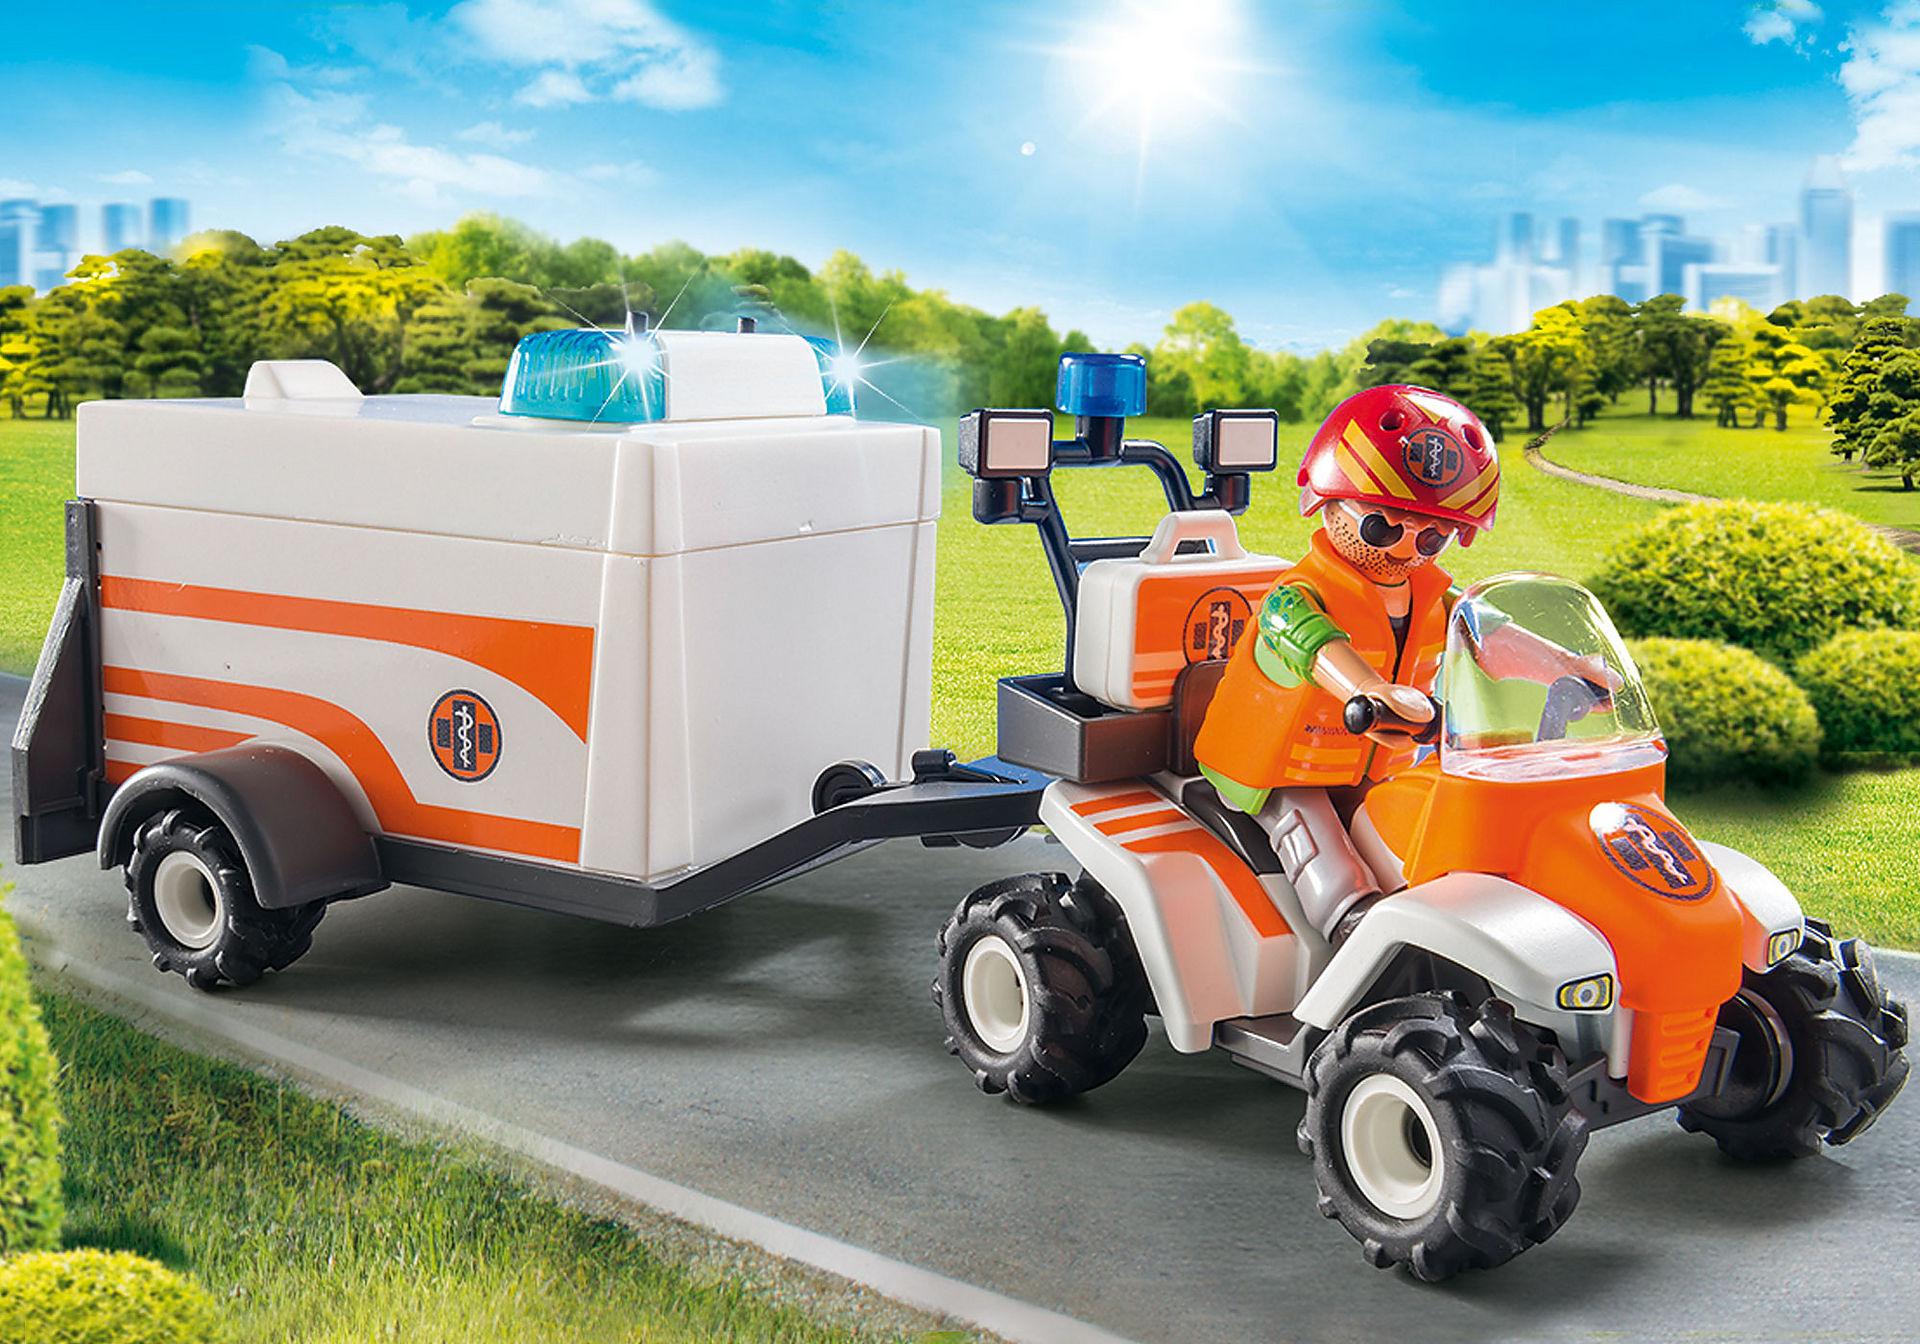 http://media.playmobil.com/i/playmobil/70053_product_extra2/Quad mit Rettungsanhänger